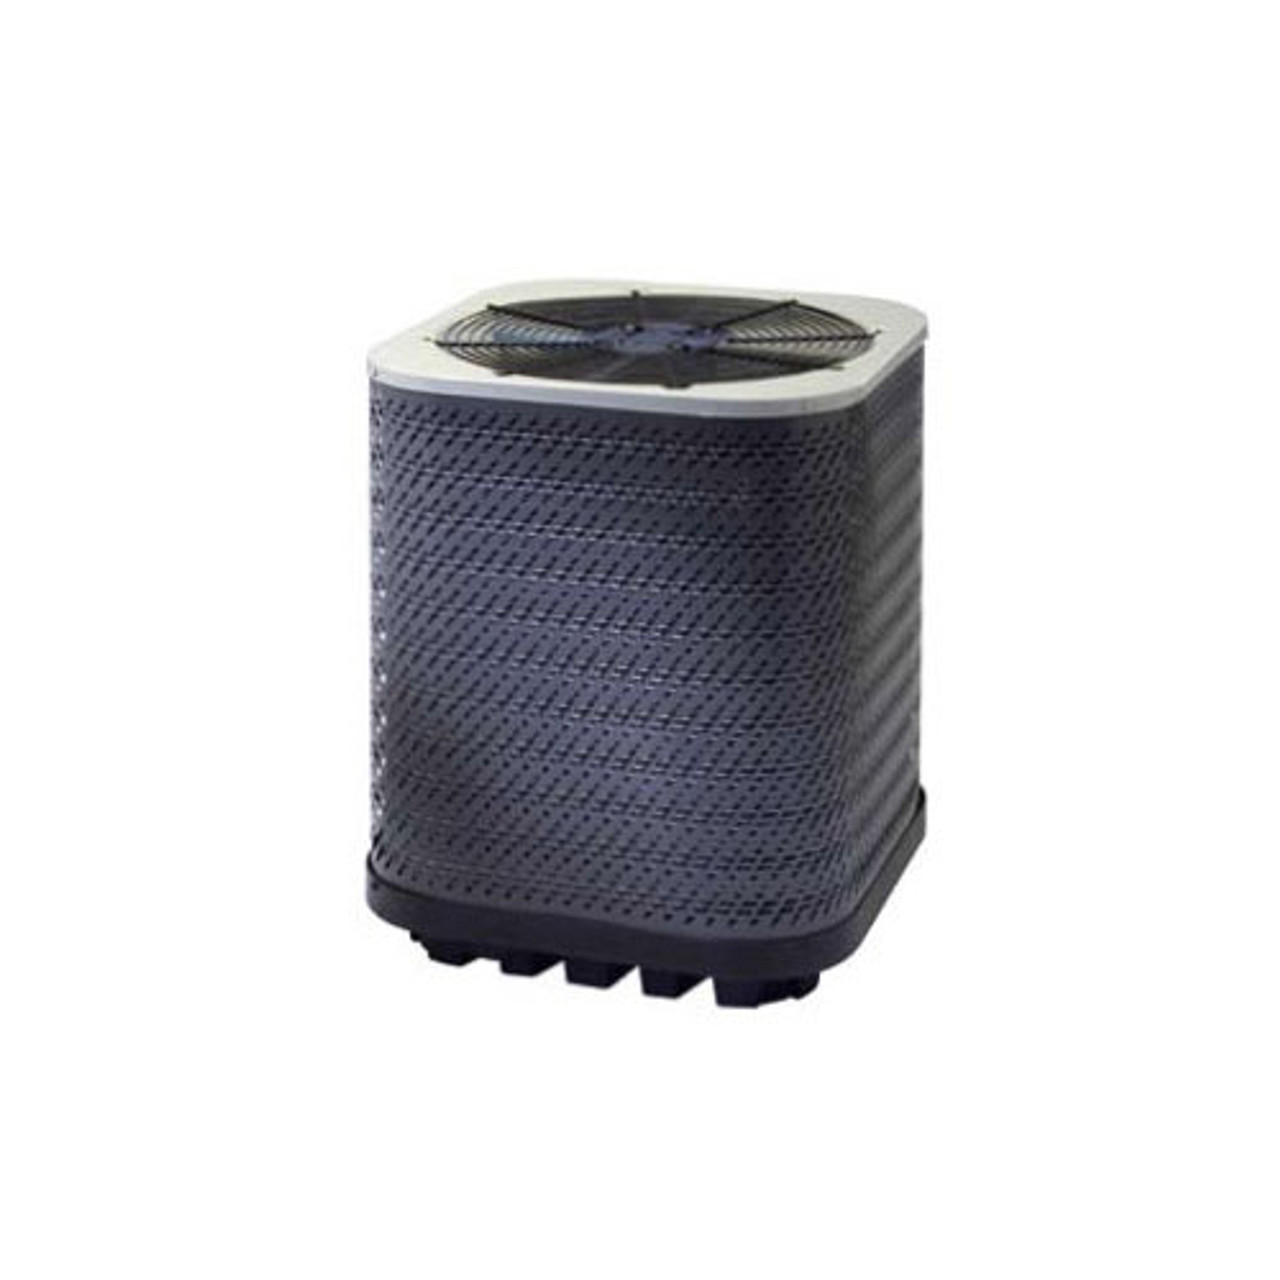 Gibson JT5BD-018K High Efficiency Heat Pump 13 SEER Residential System - New